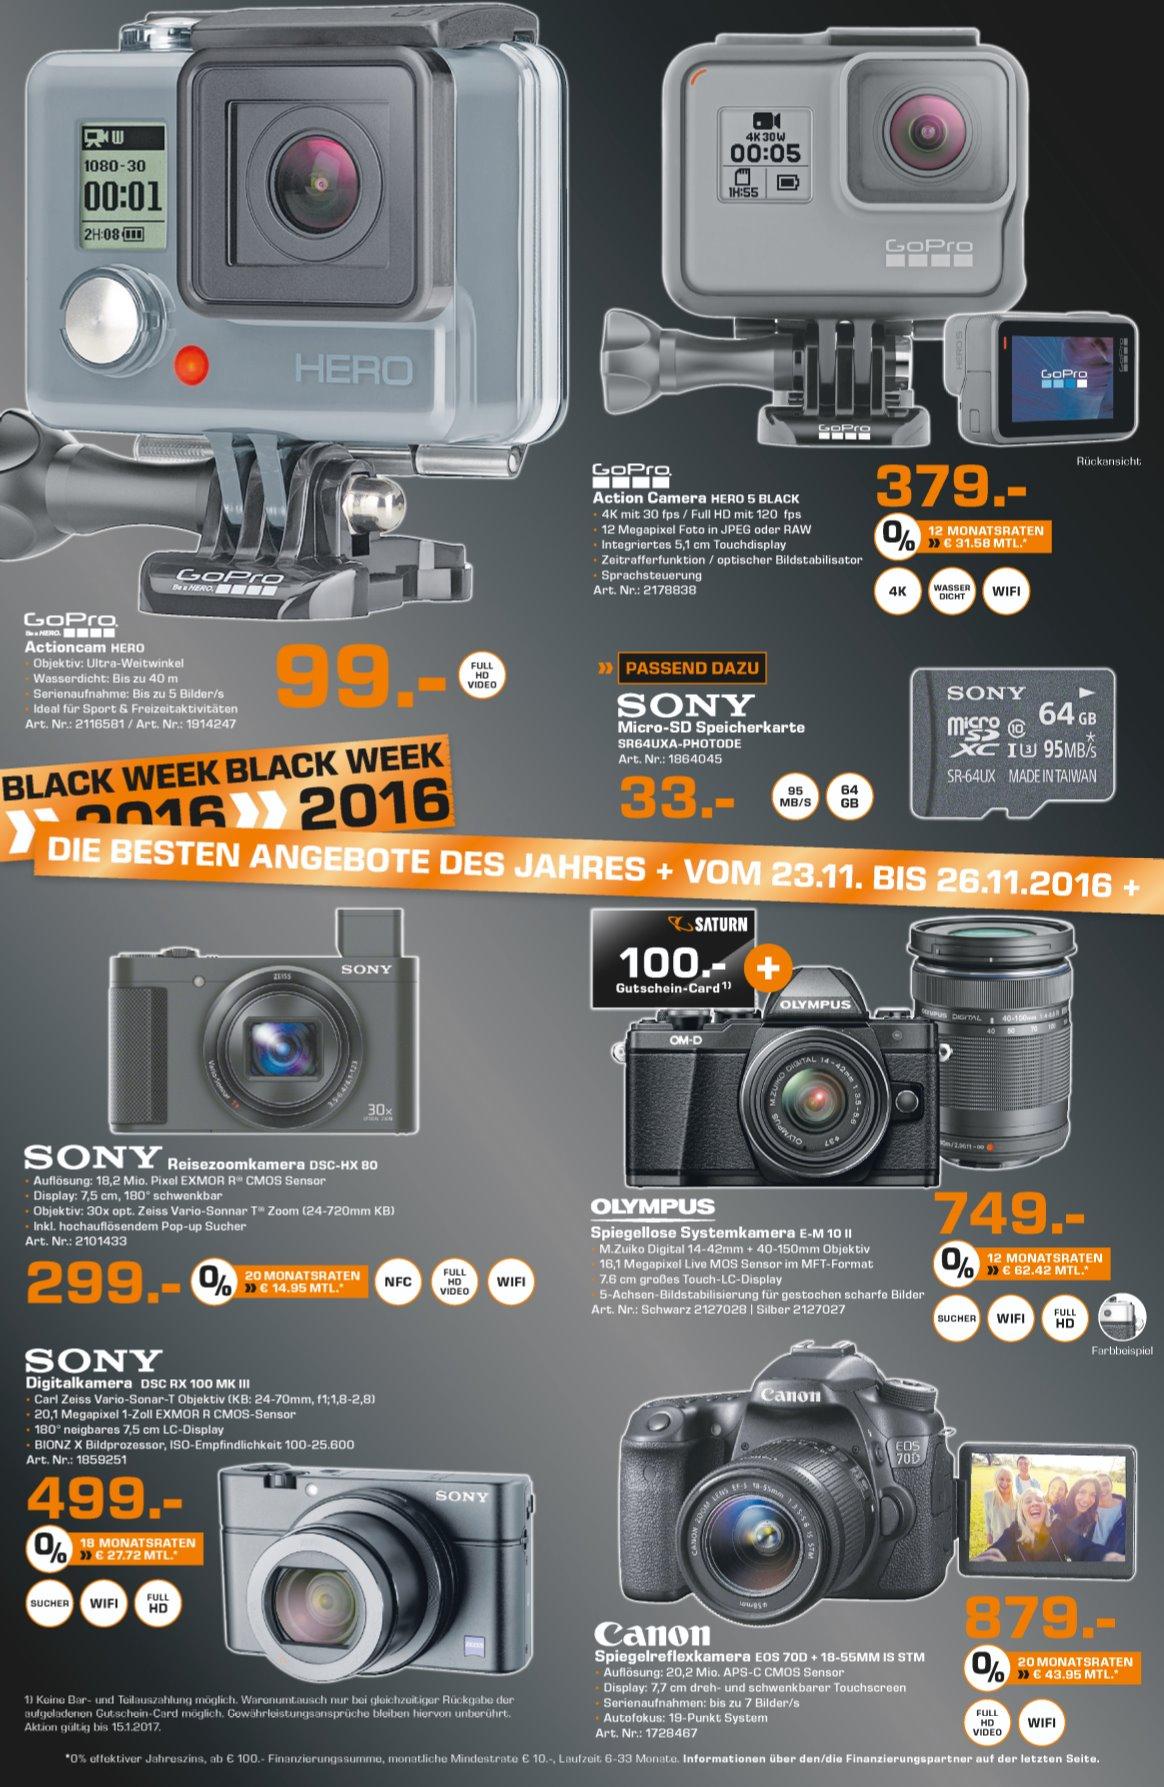 [SATURN-HH] Sony Cyber-Shot DSC-RX100 III Mark 3 M3 für 499€ [LOKAL]